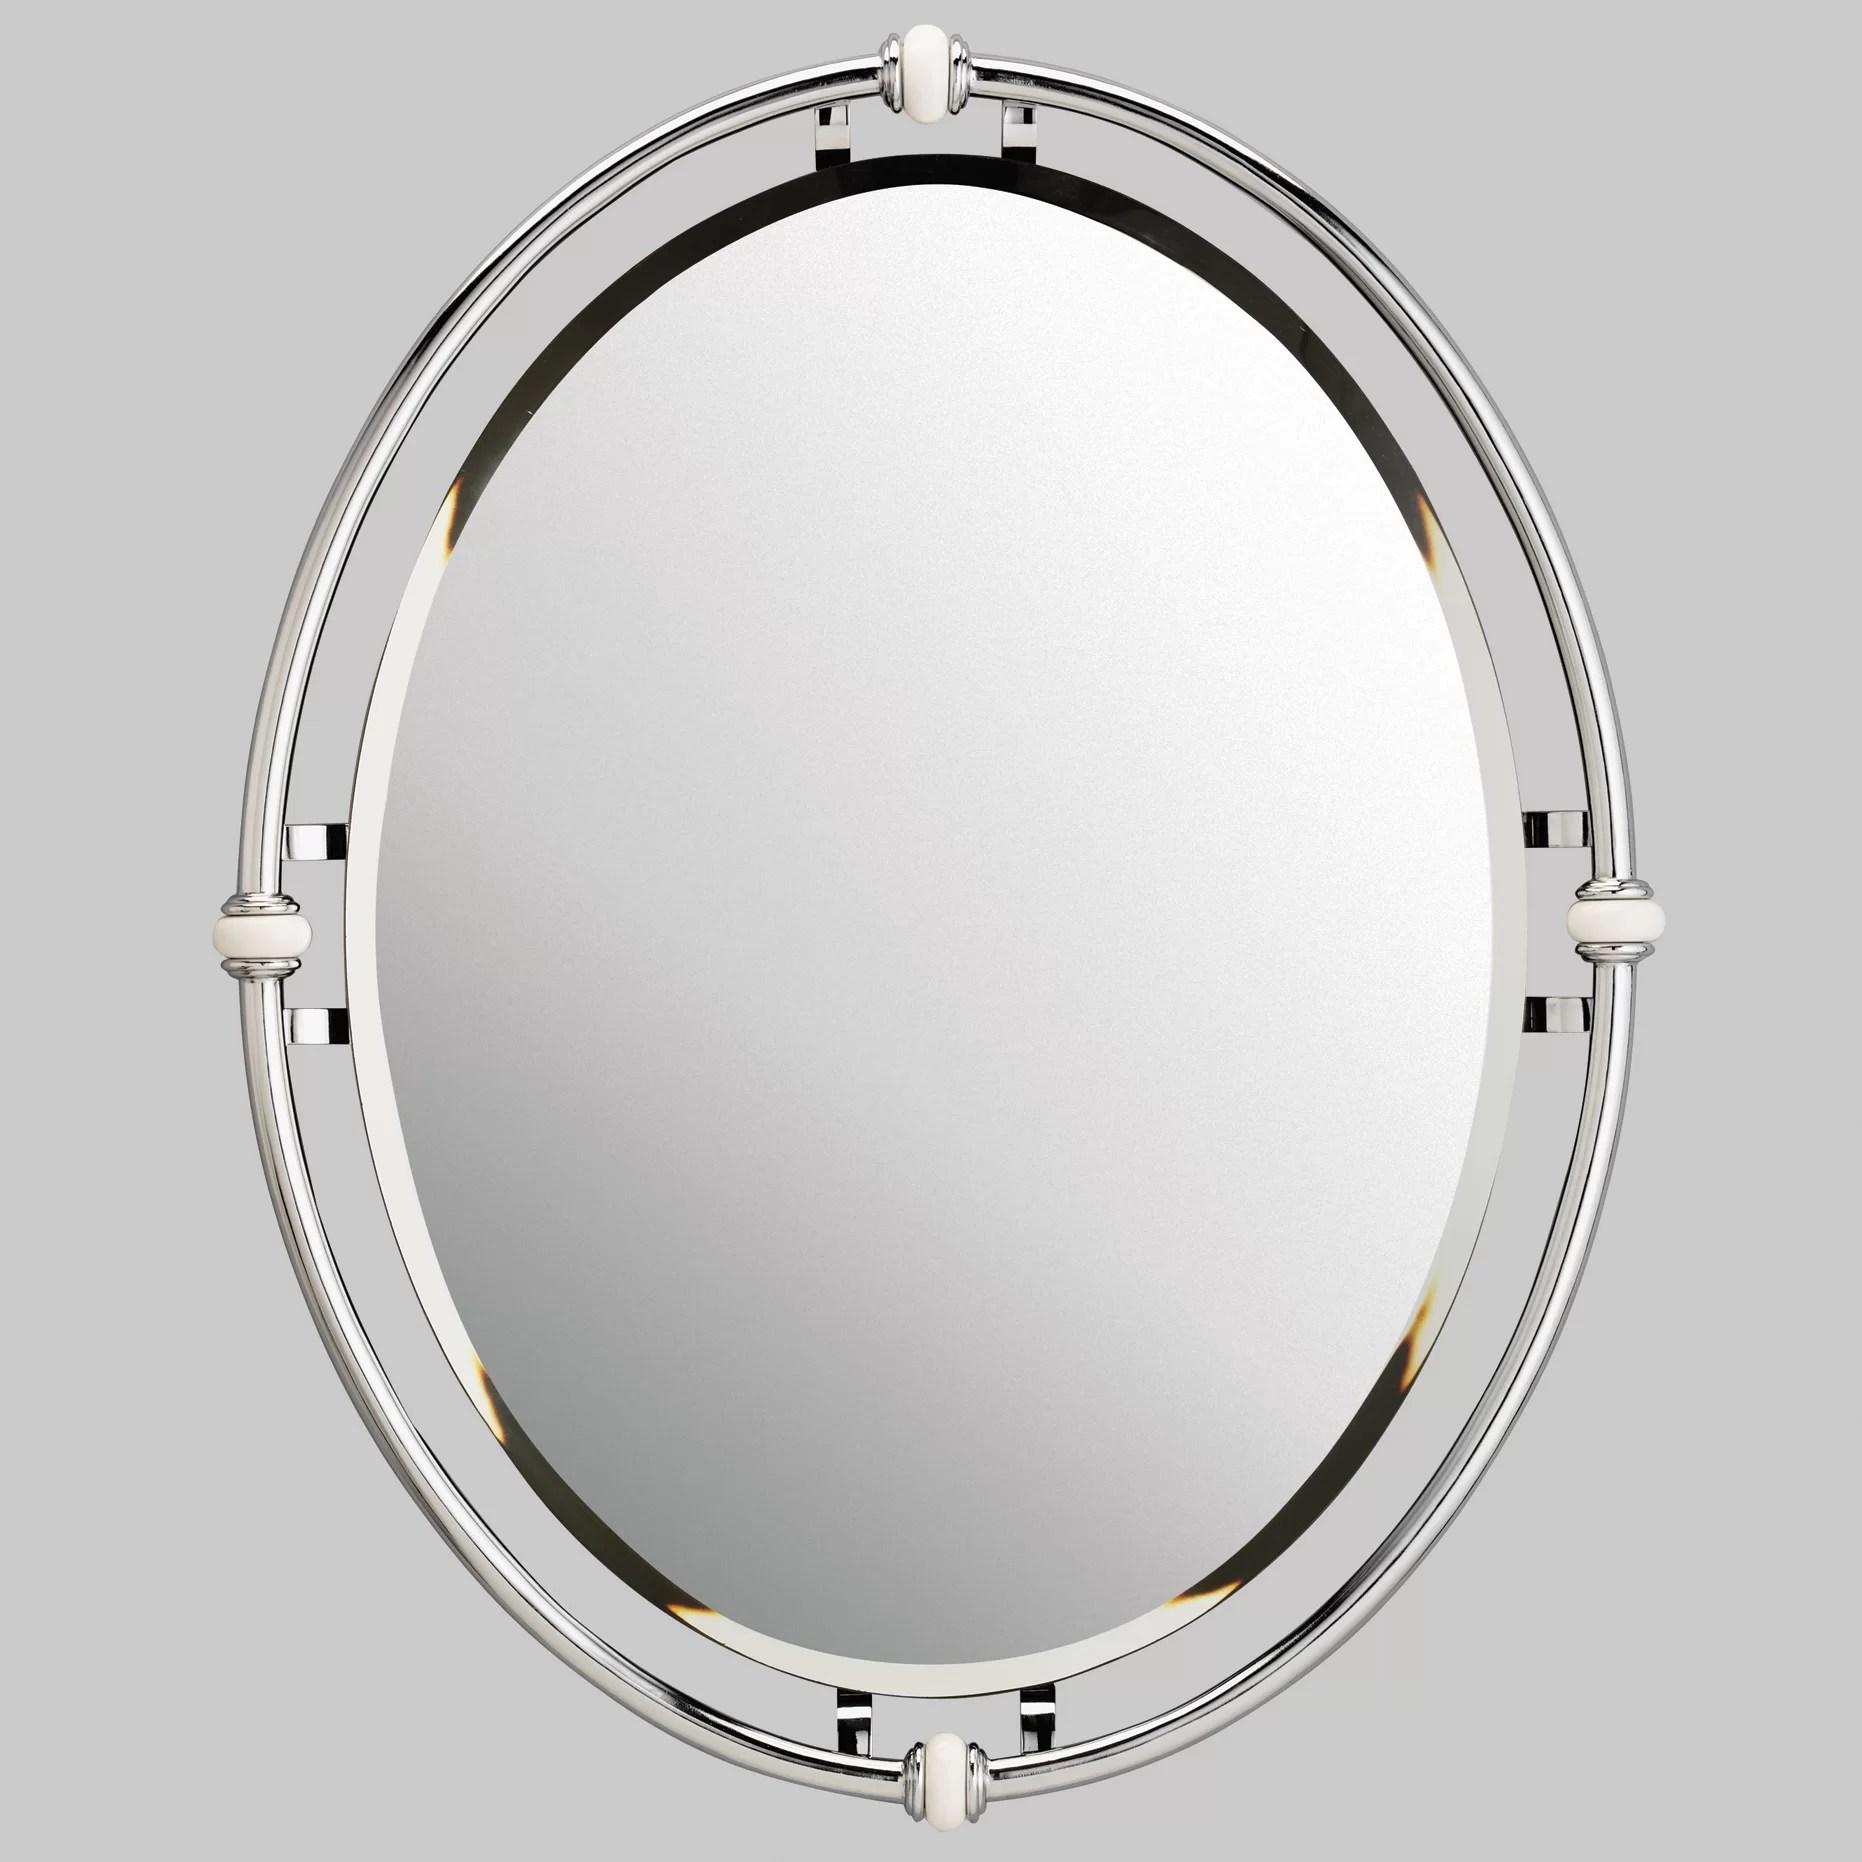 Kichler Oval Beveled Mirror & Reviews